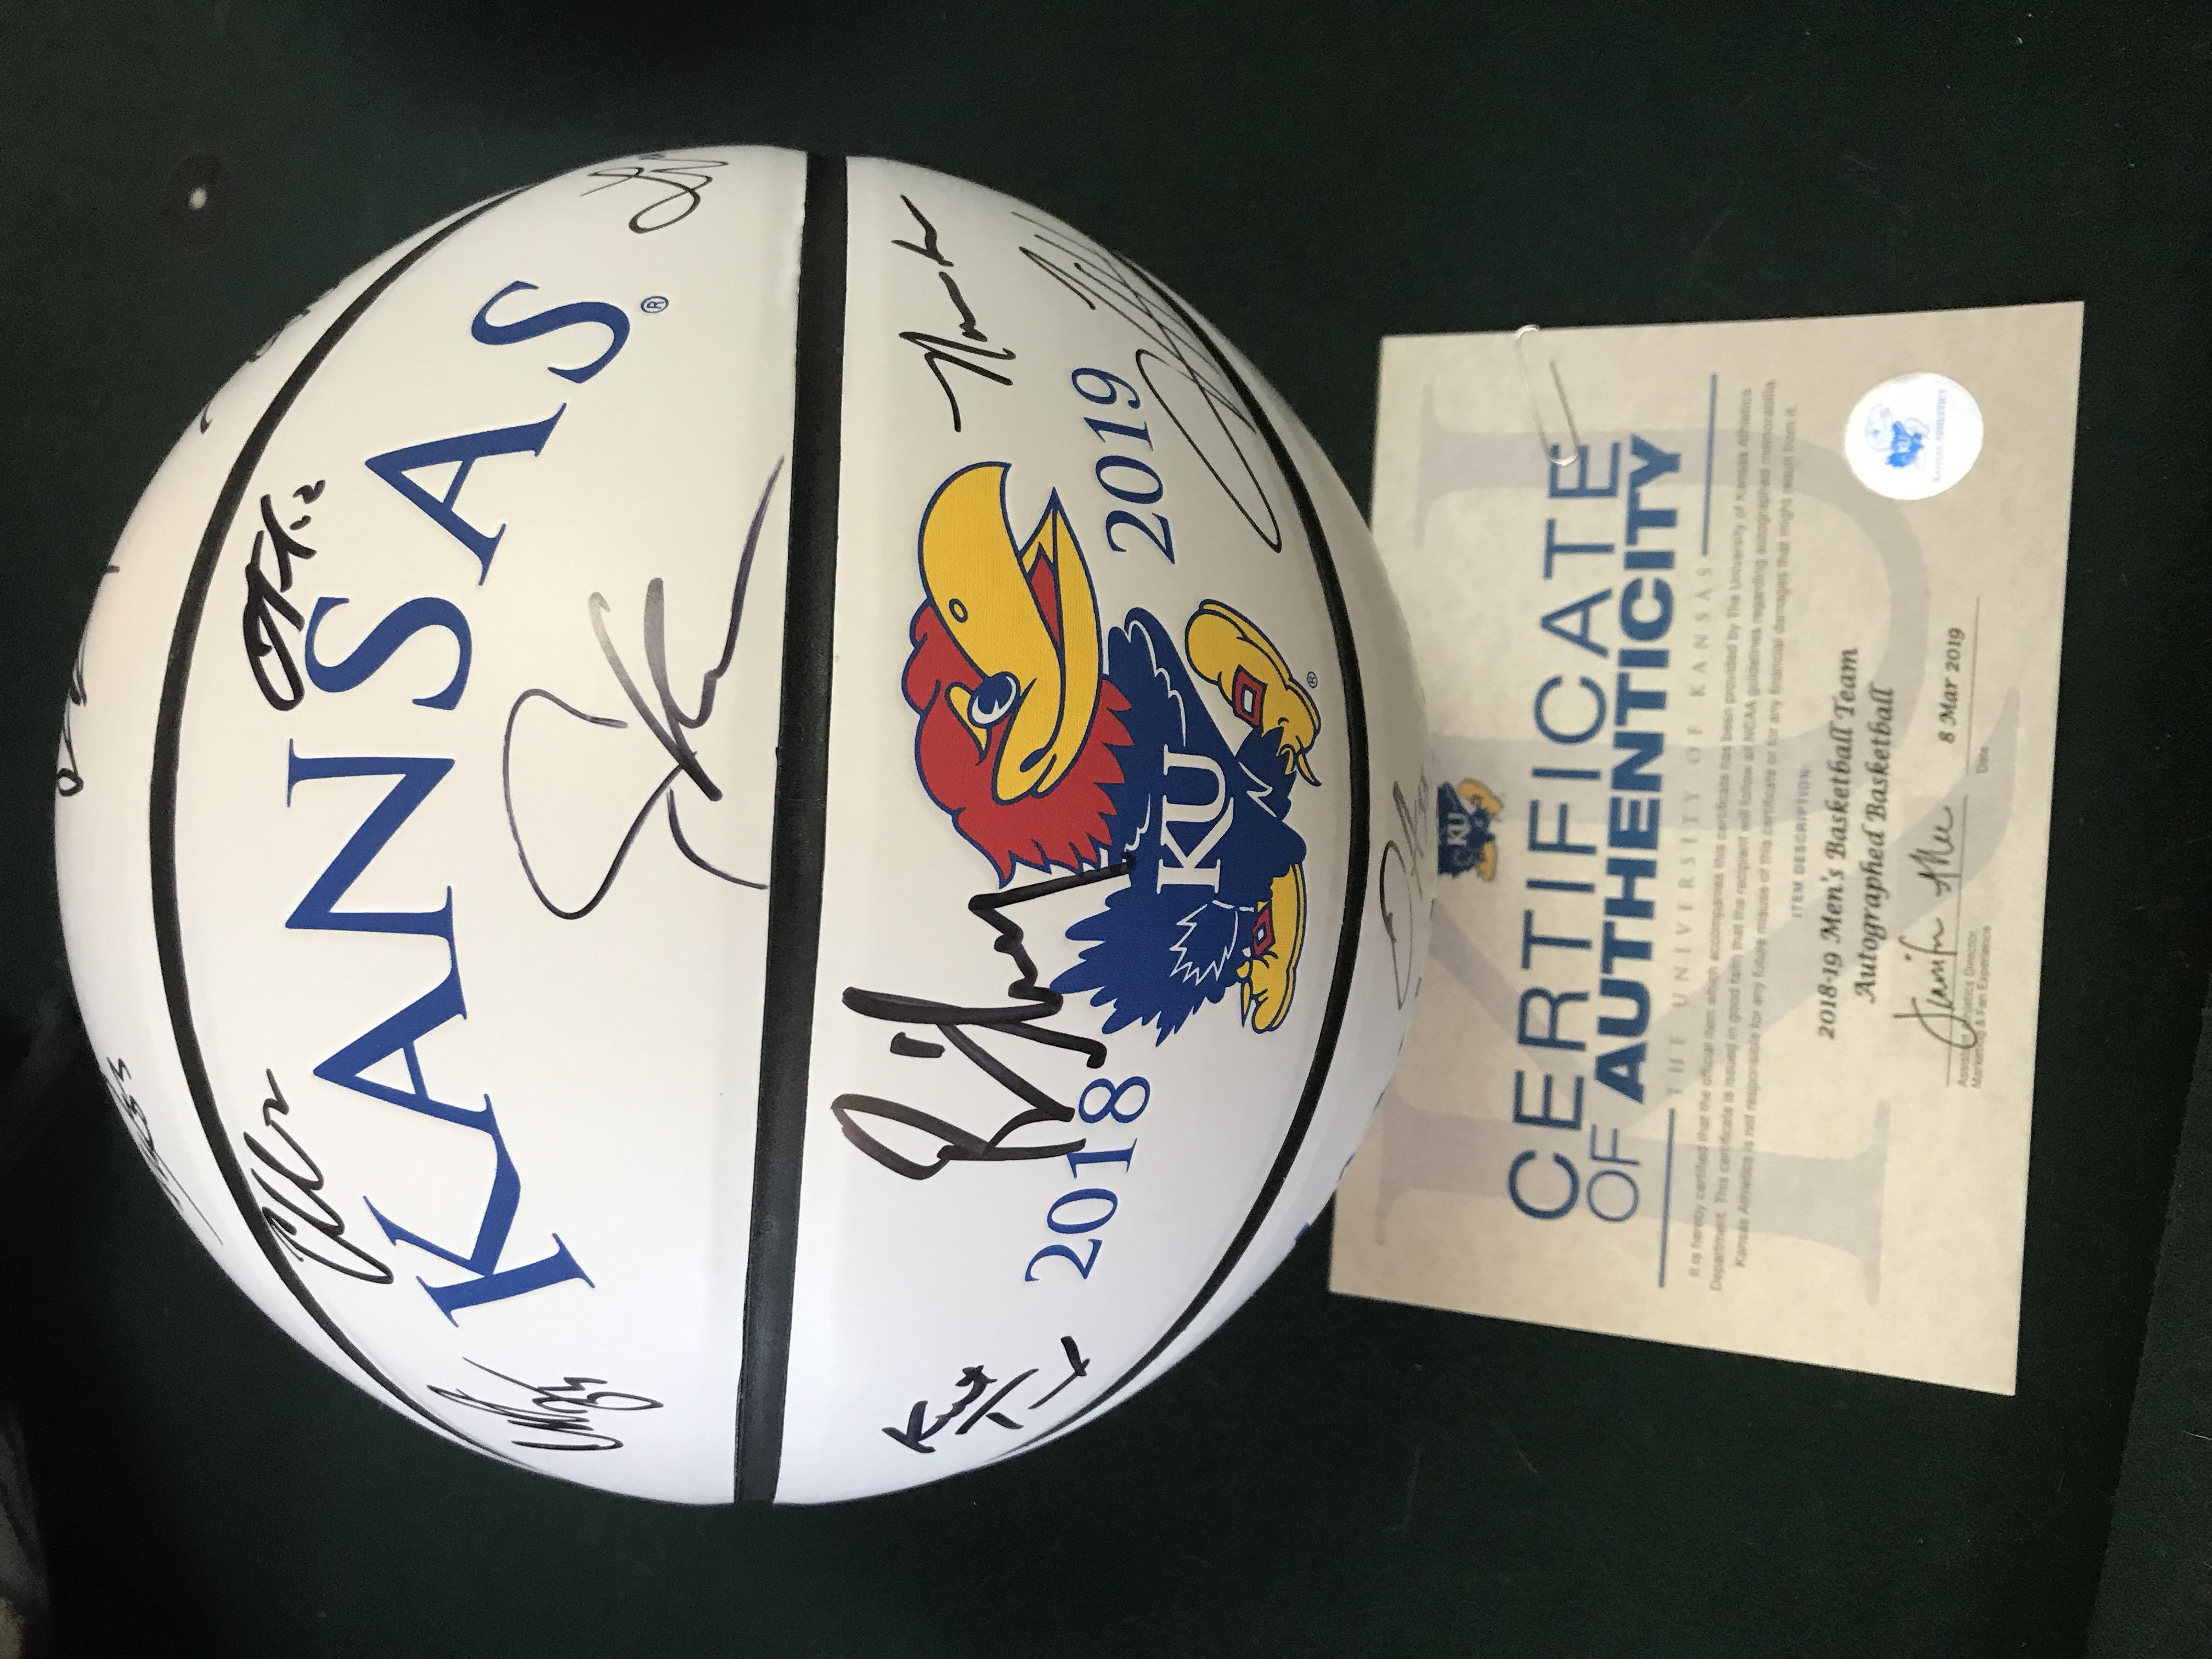 2018/19 KU Team Signed Basketball